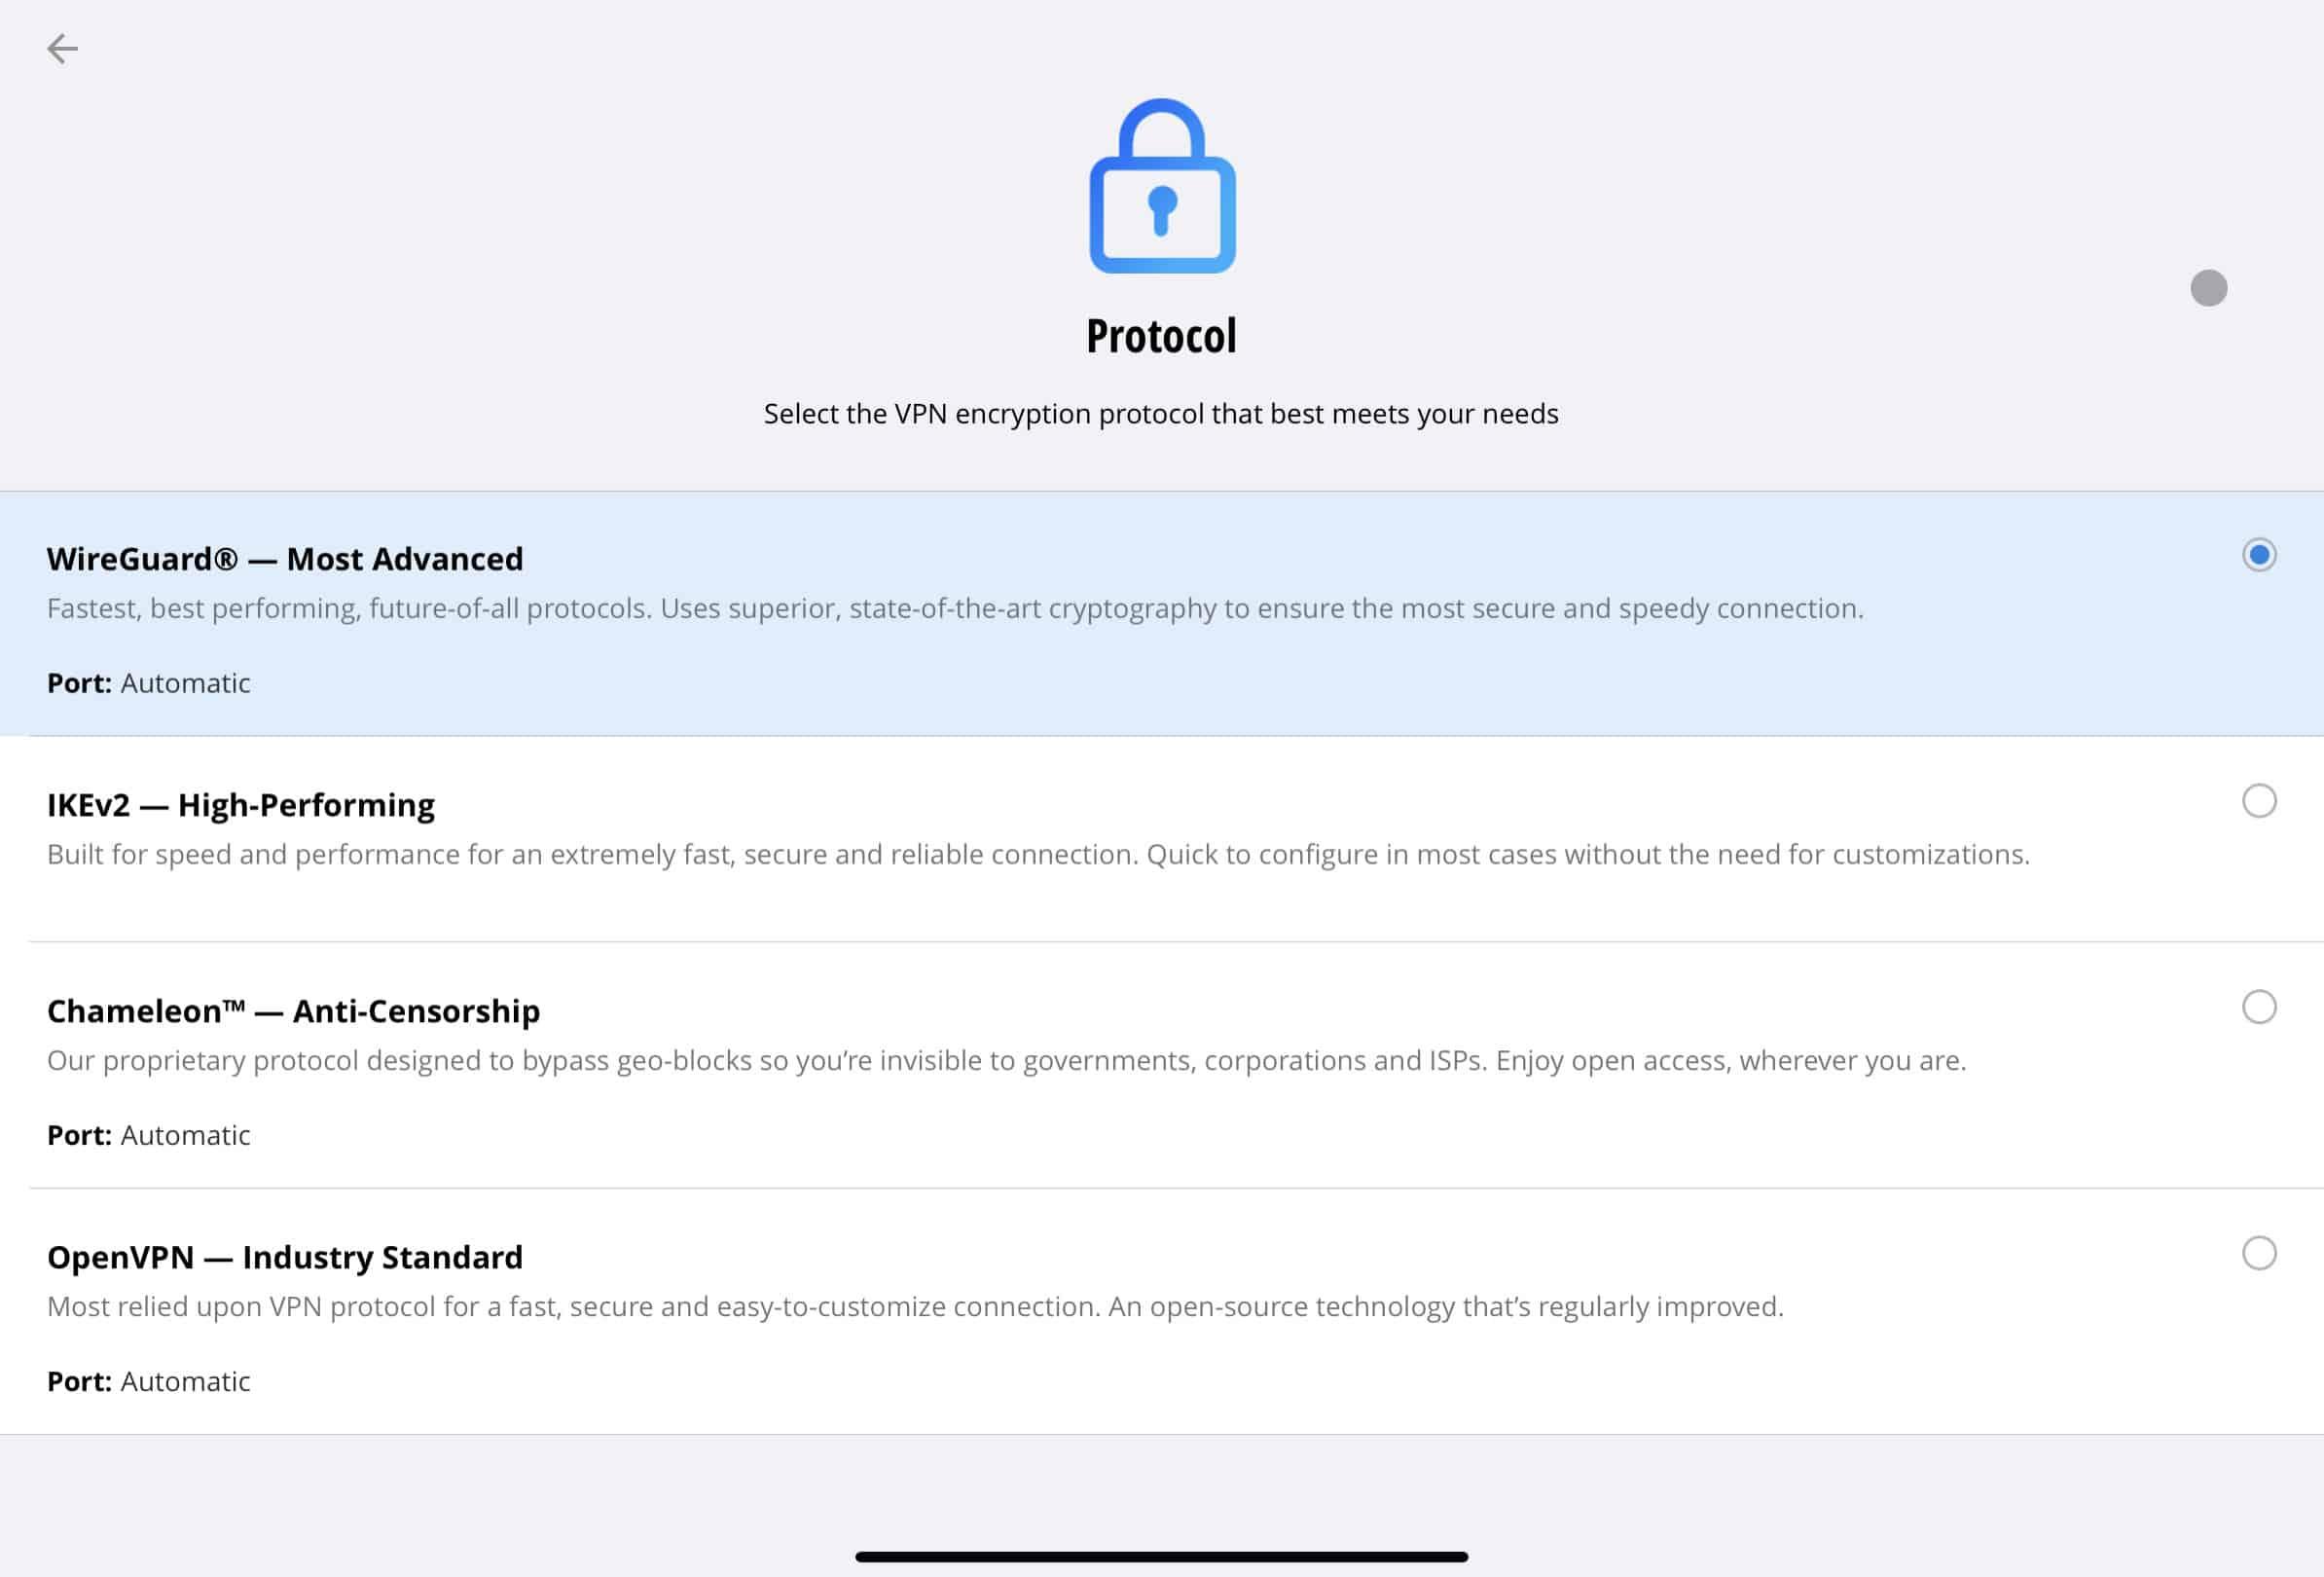 VyprVPN Encryption Protocol